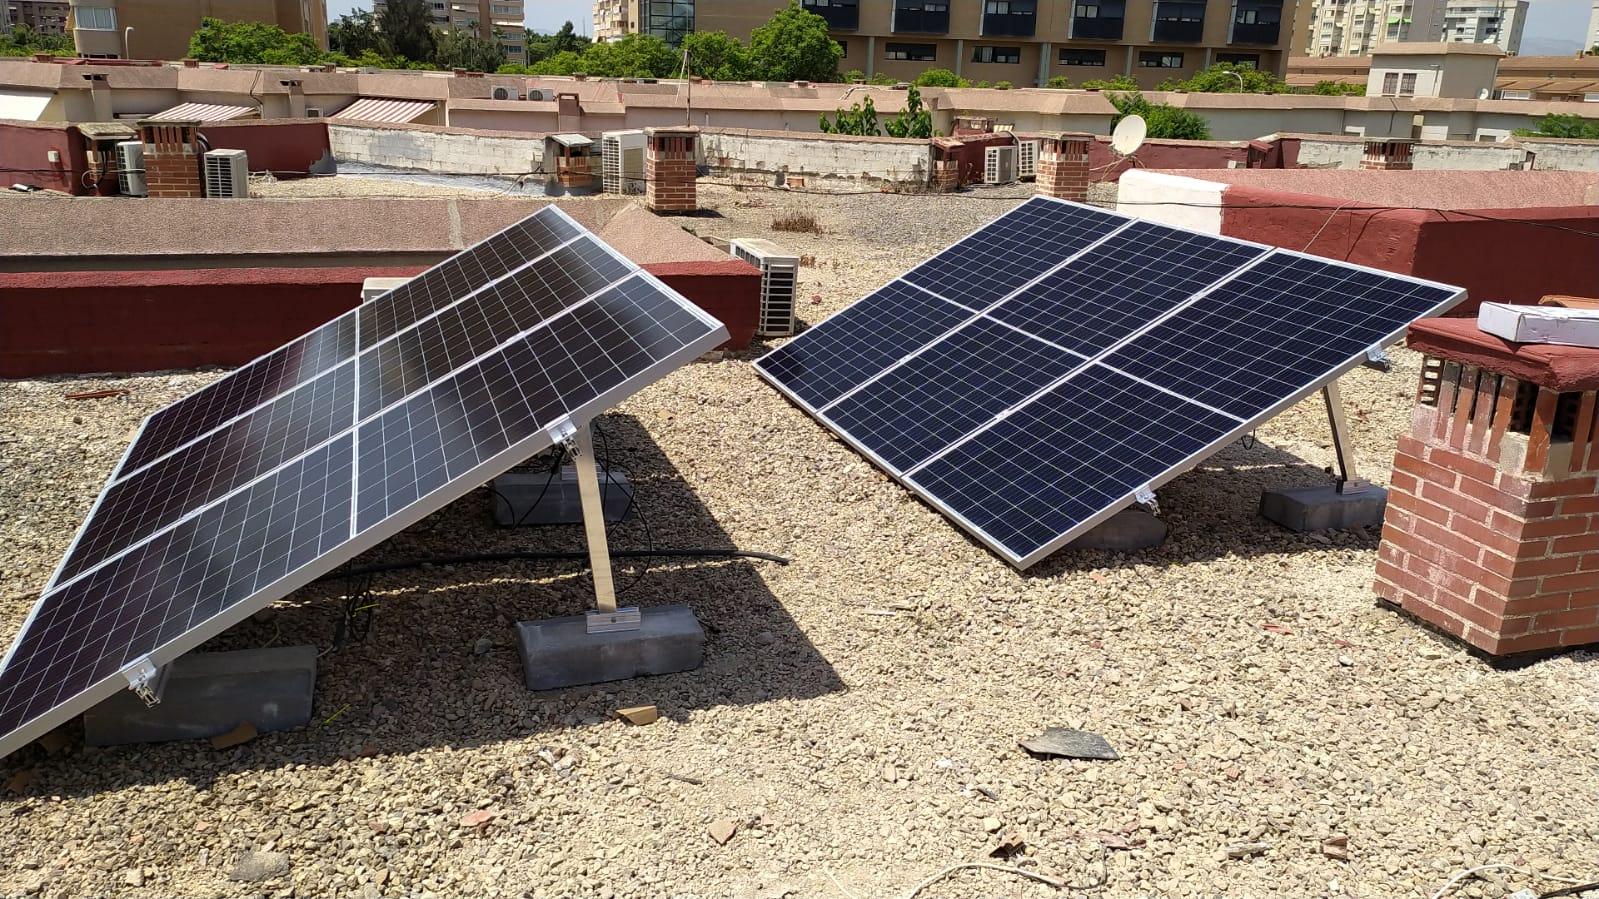 Placas solares sobre cubierta plana